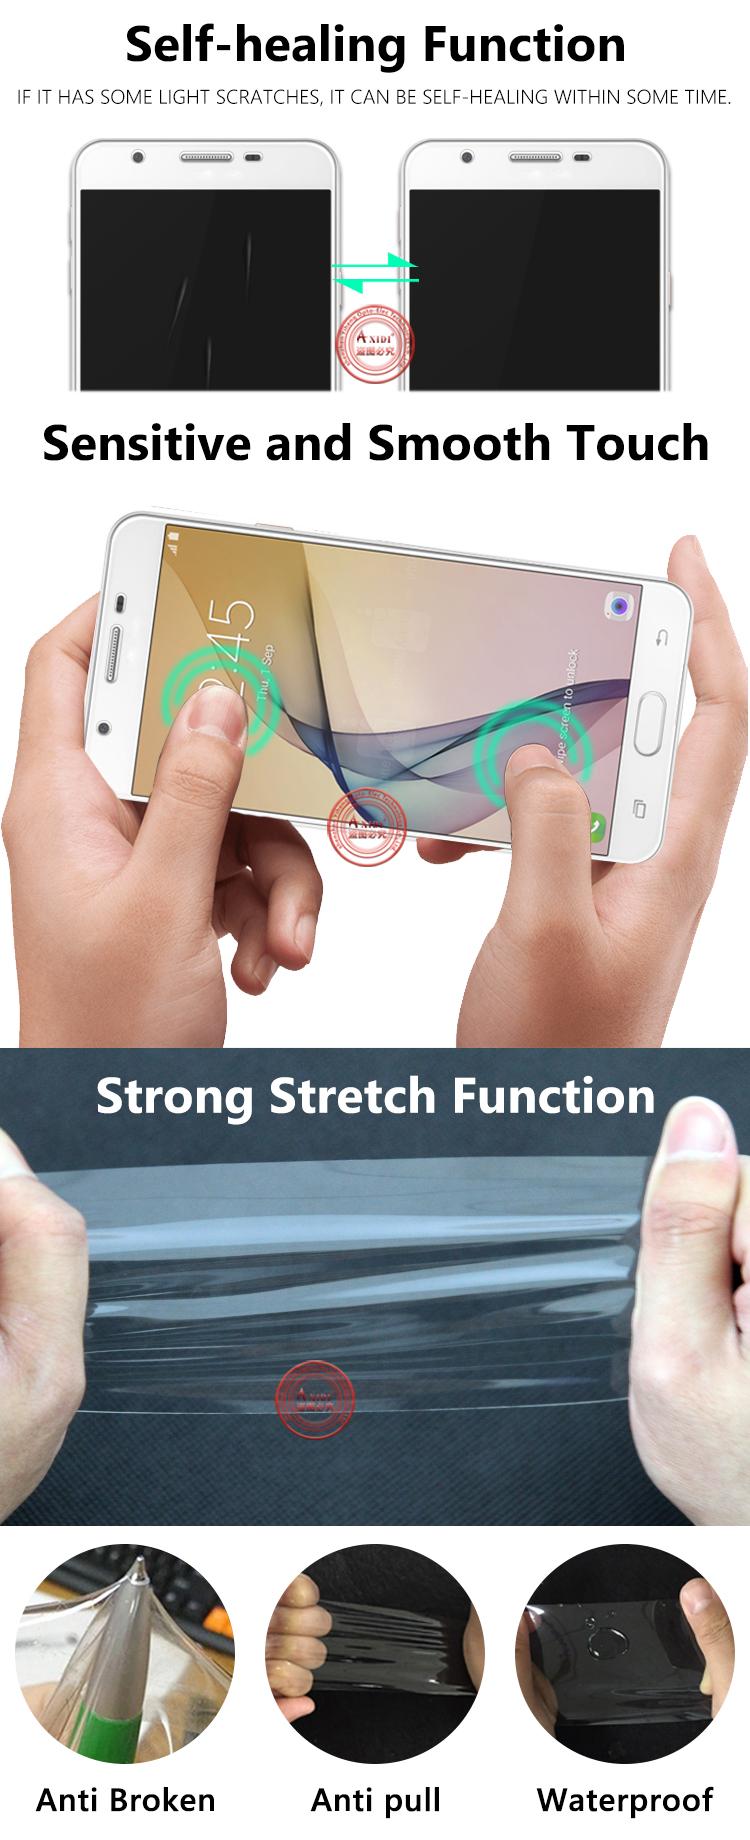 Samsung J7 Touch Sensitivity